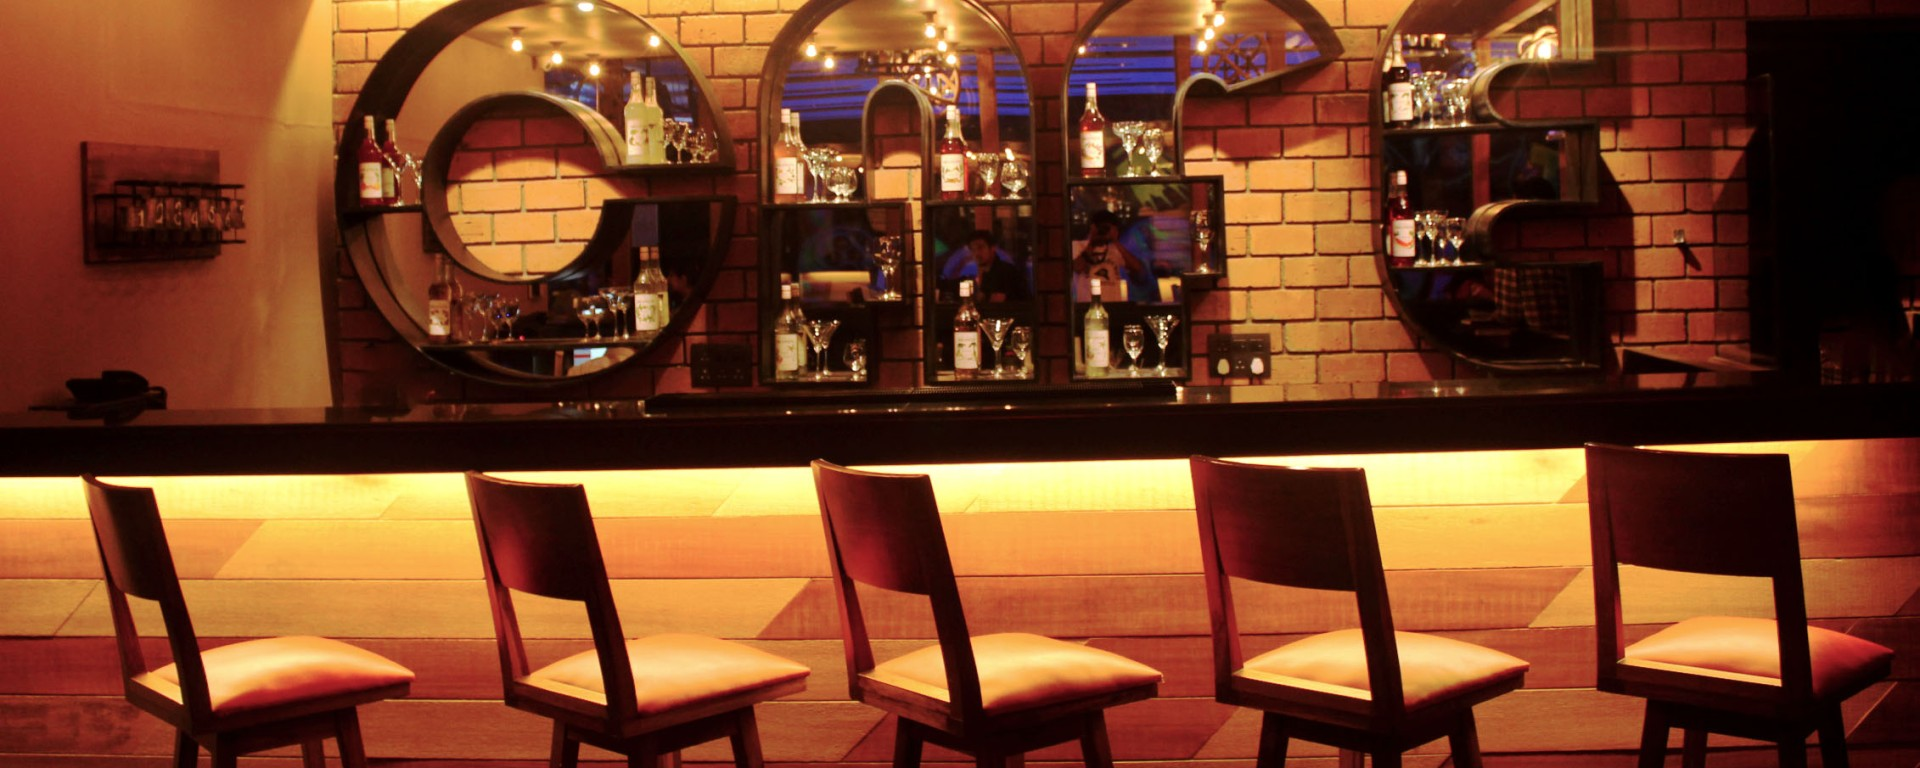 31st Street Bar & Cafe